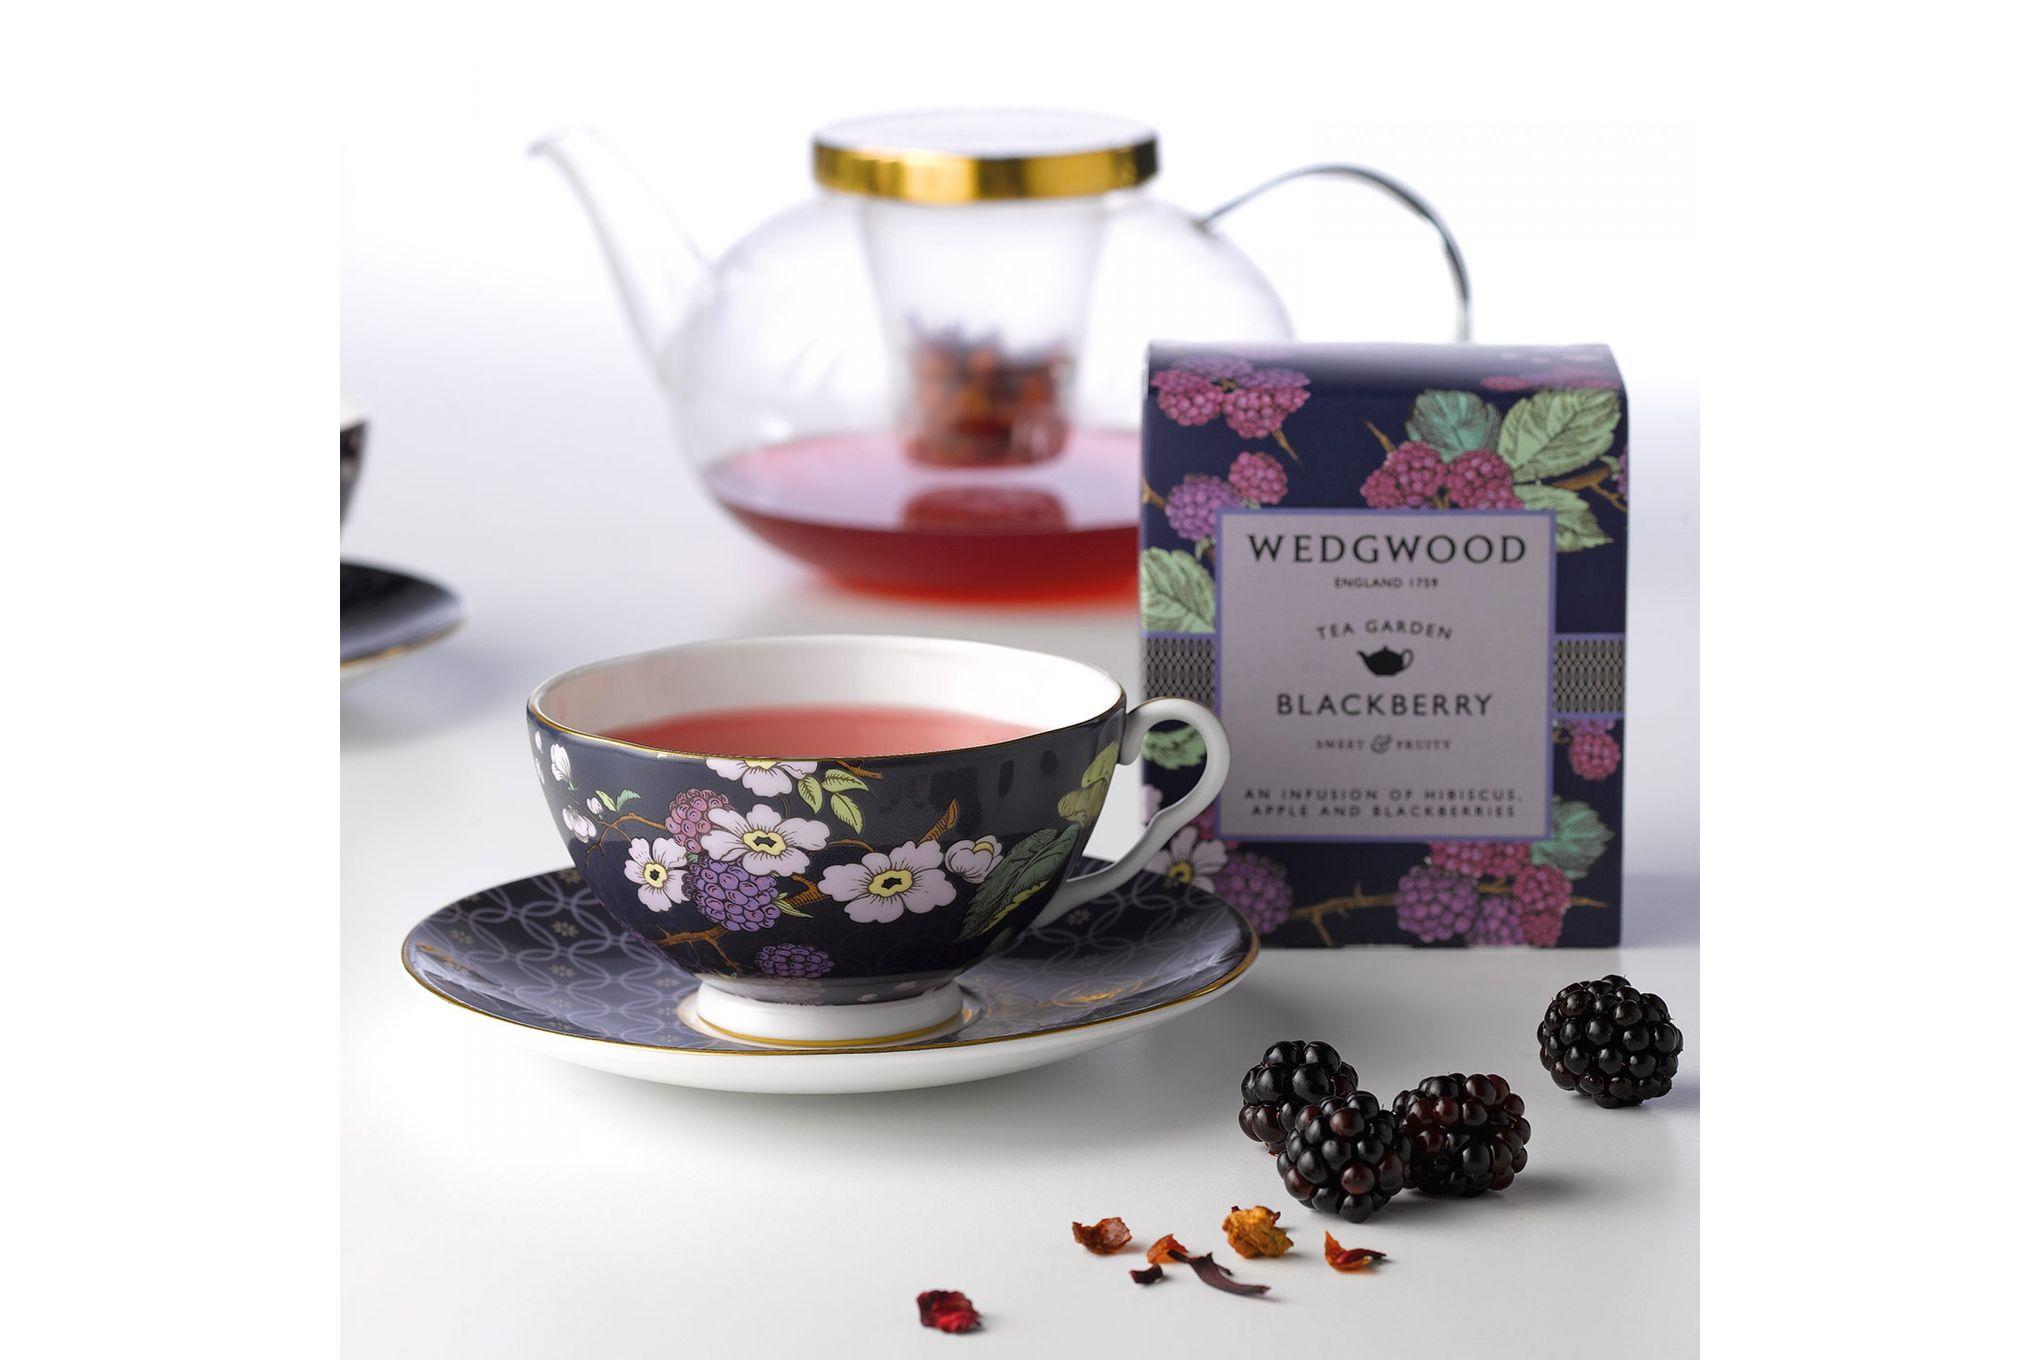 Wedgwood Tea Garden 3 Piece Set Plate 21cm, Teacup & Saucer Blackberry thumb 2